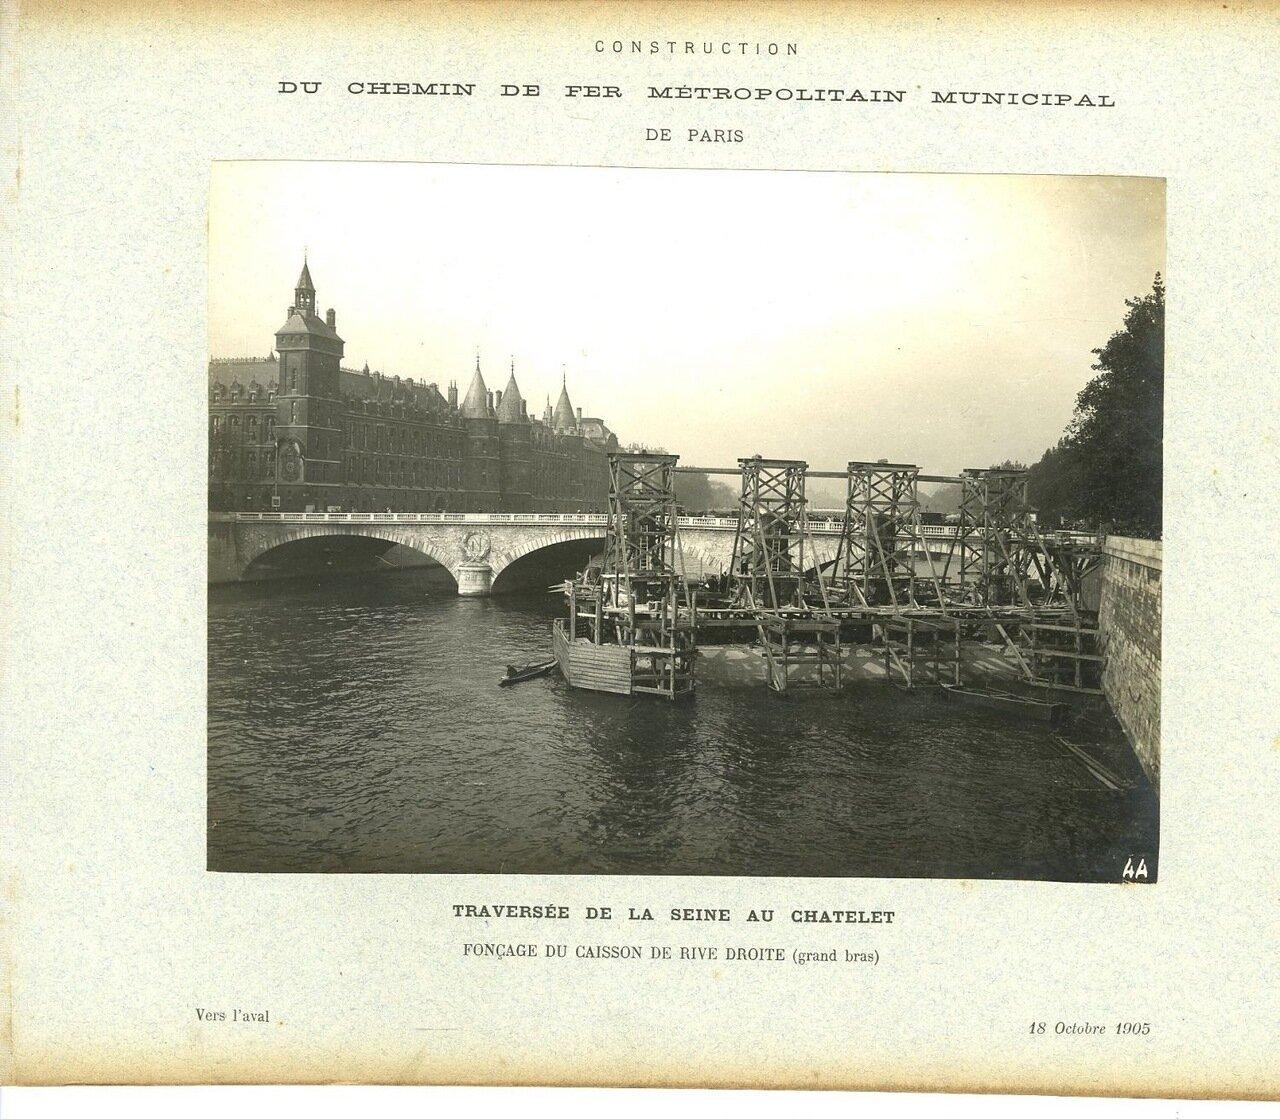 1905, 18 октября